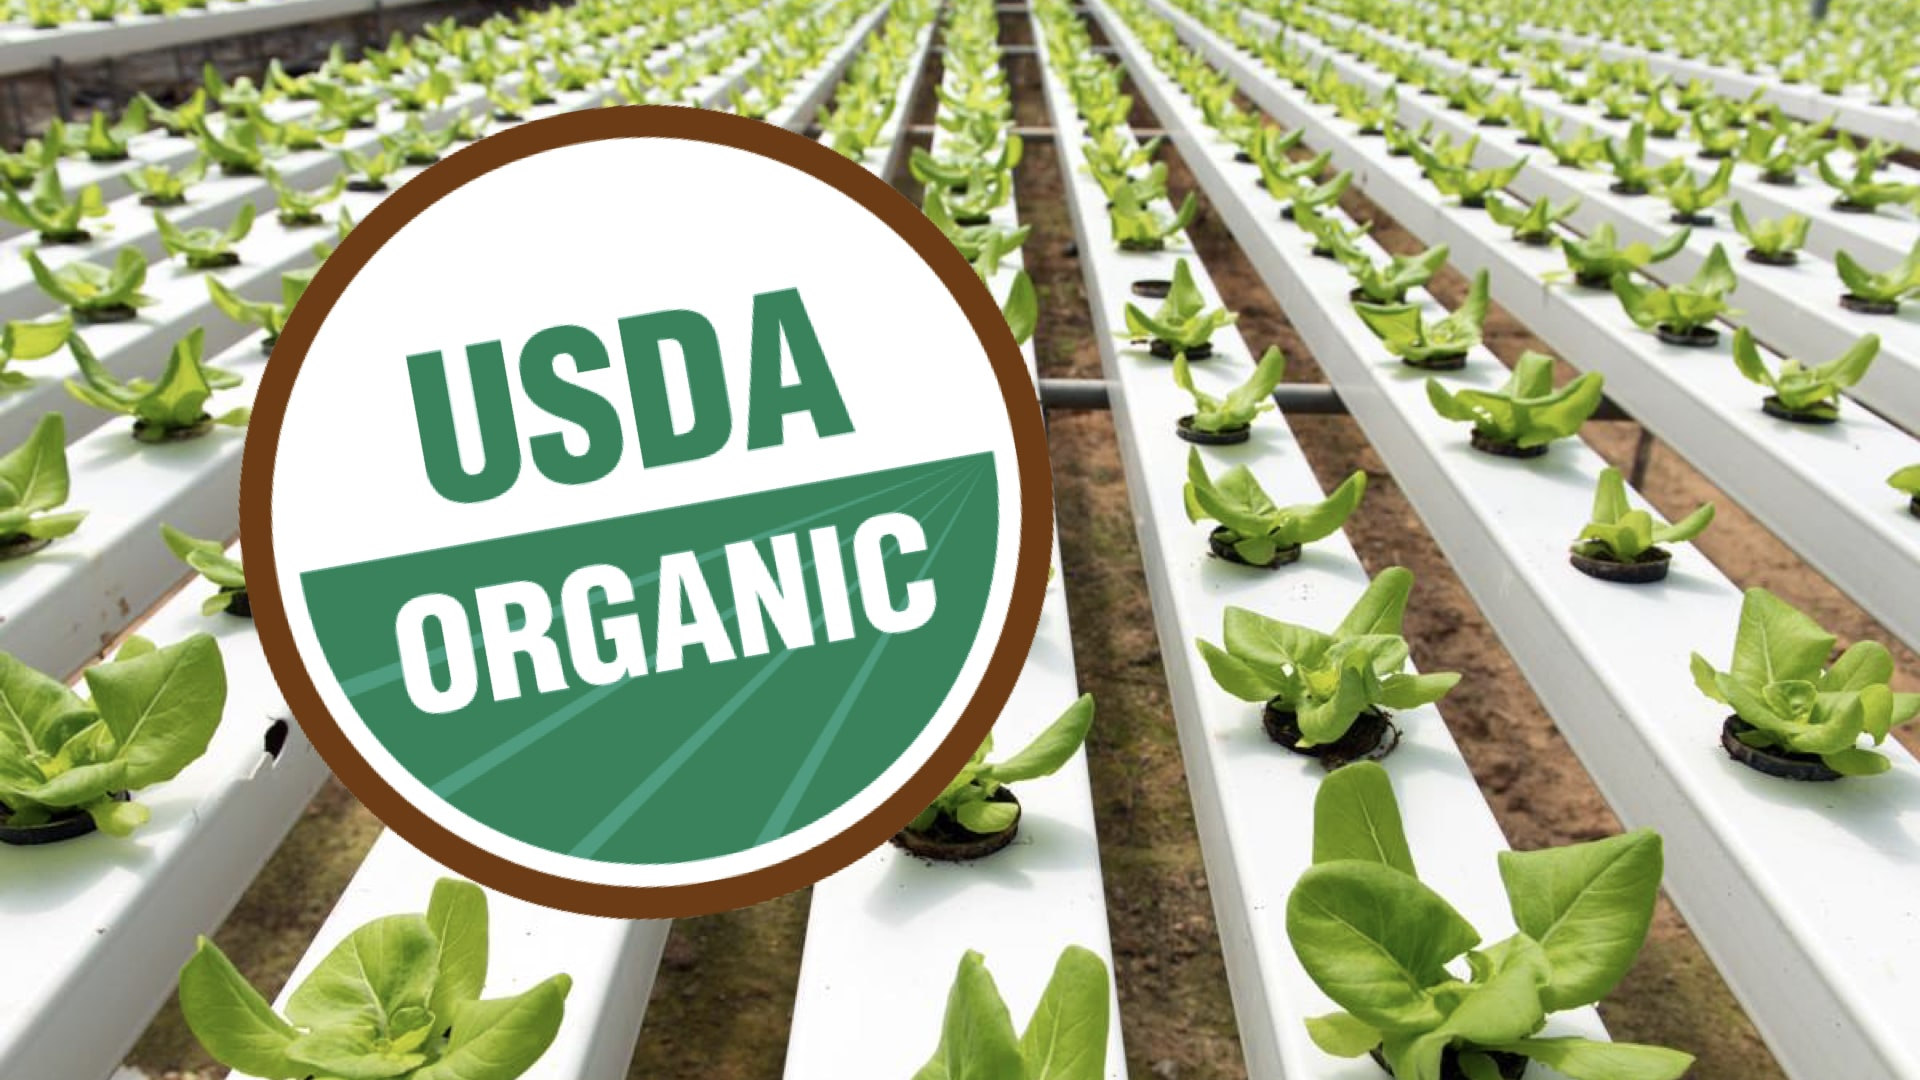 USDA-Organic-label-Hydroponic-II.jpeg.001-min